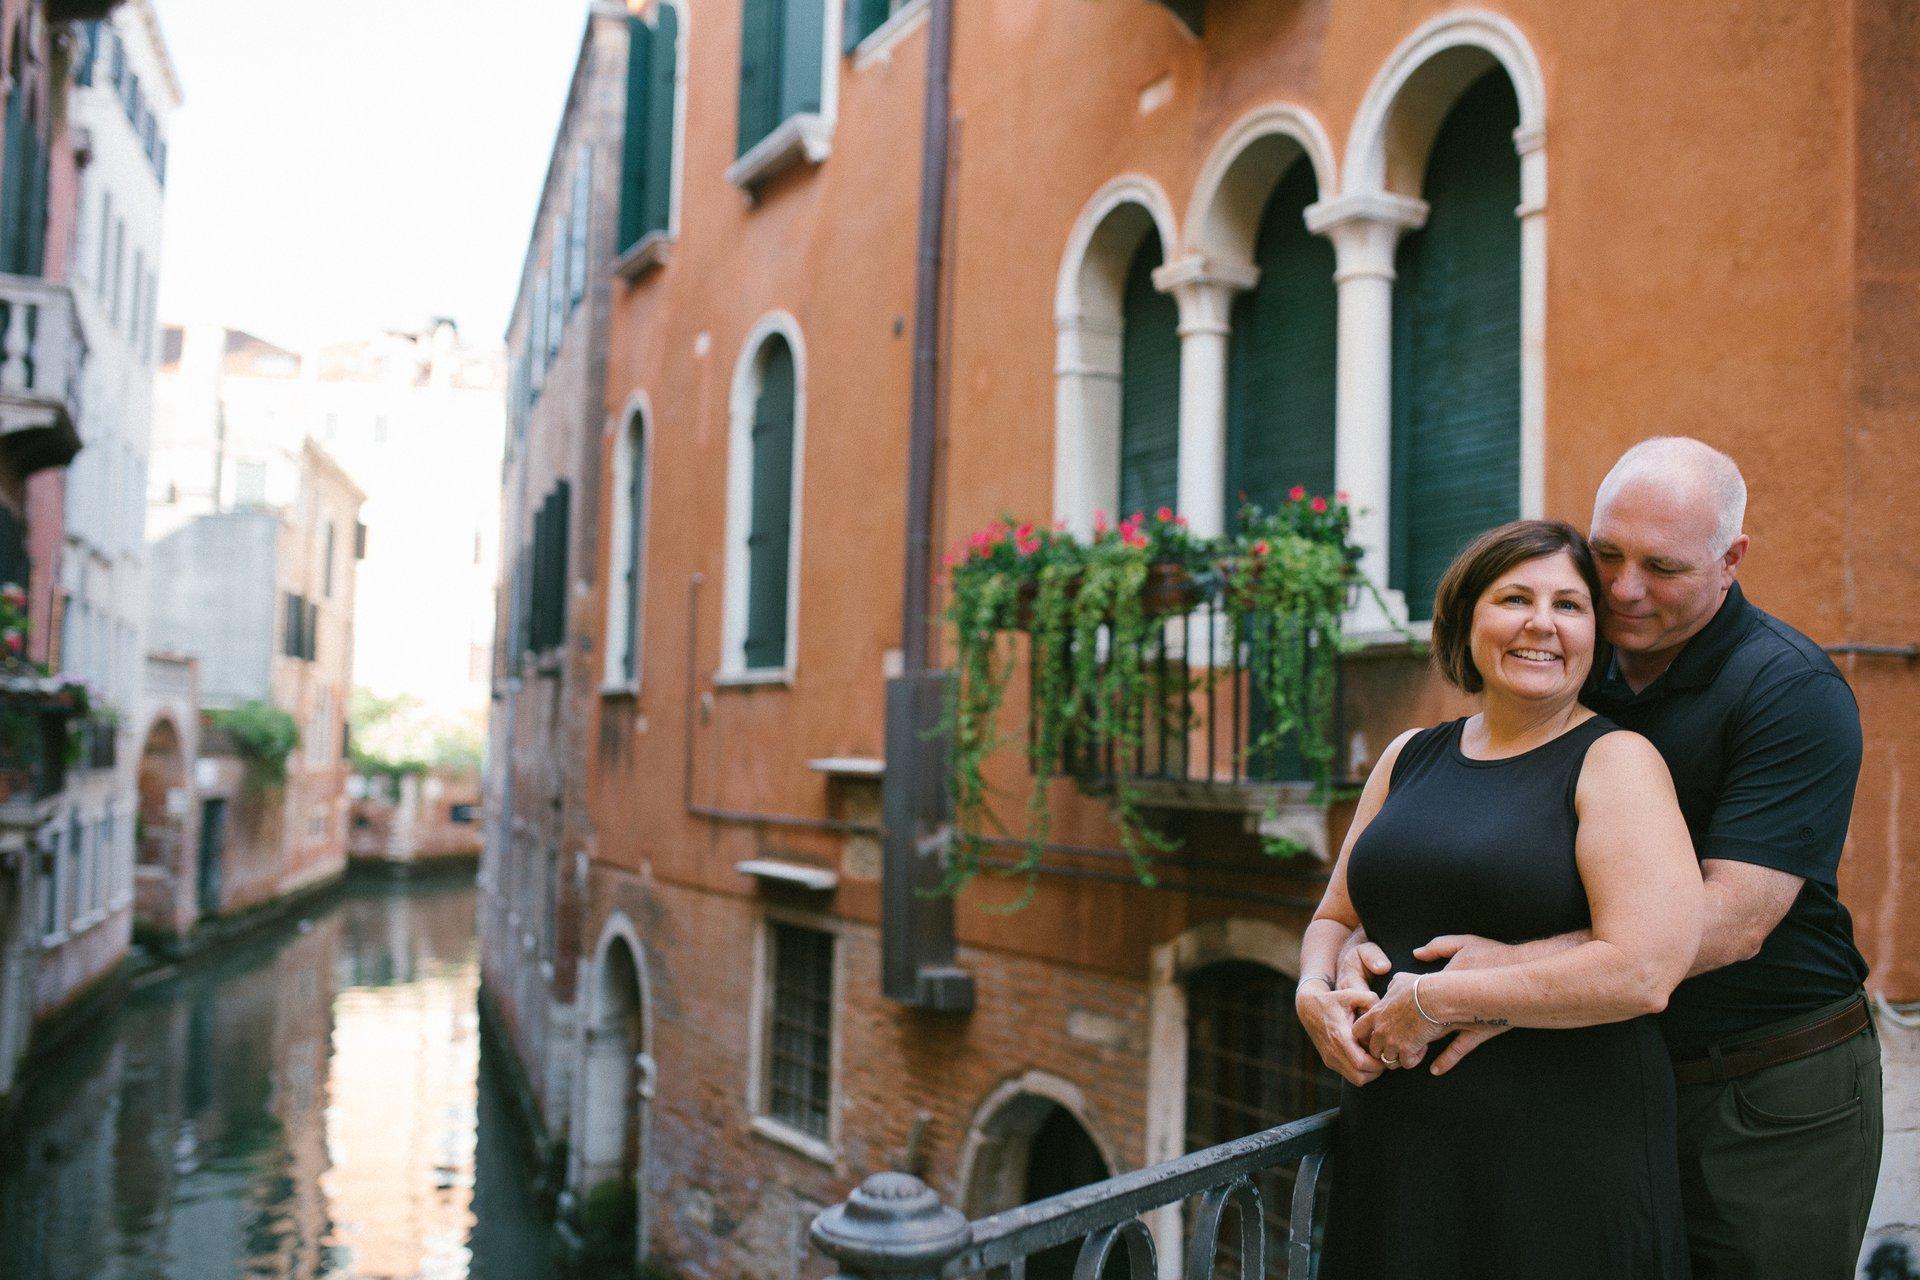 Venice-Italy-travel-story-Flytographer-31